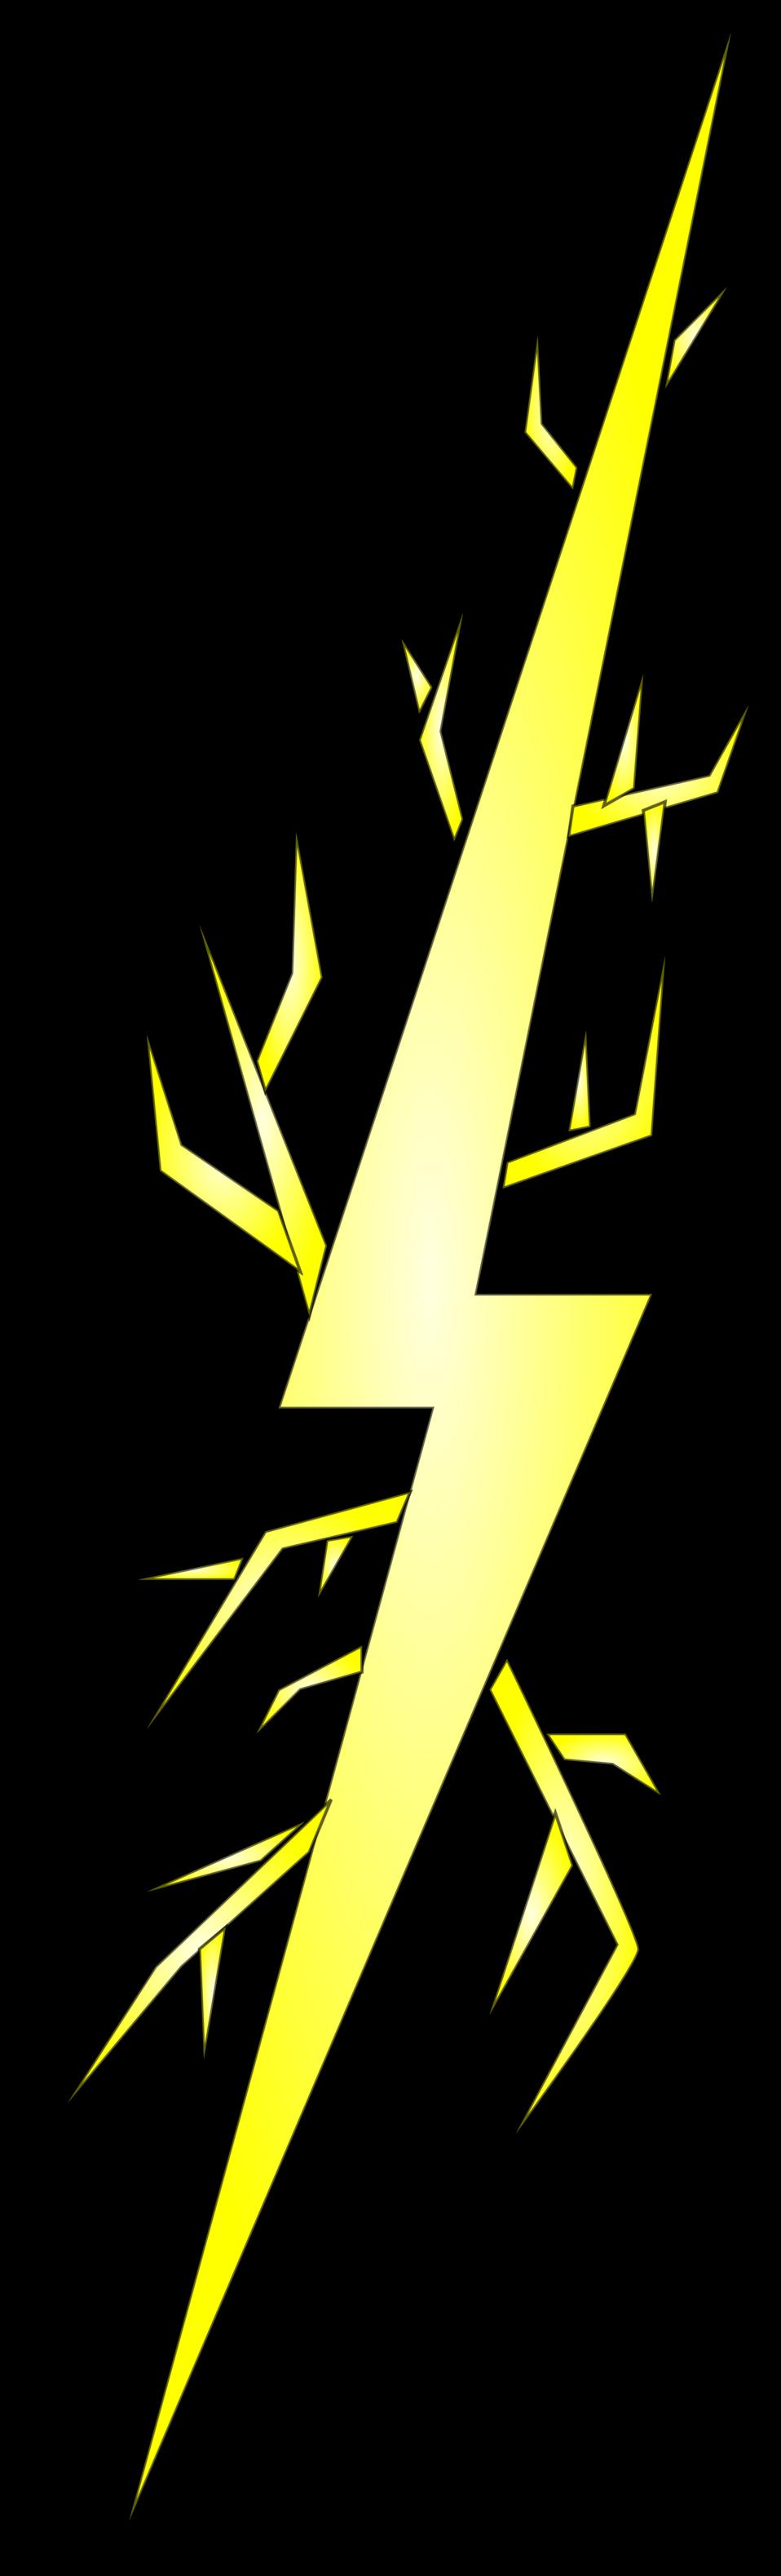 bolt2 yellow